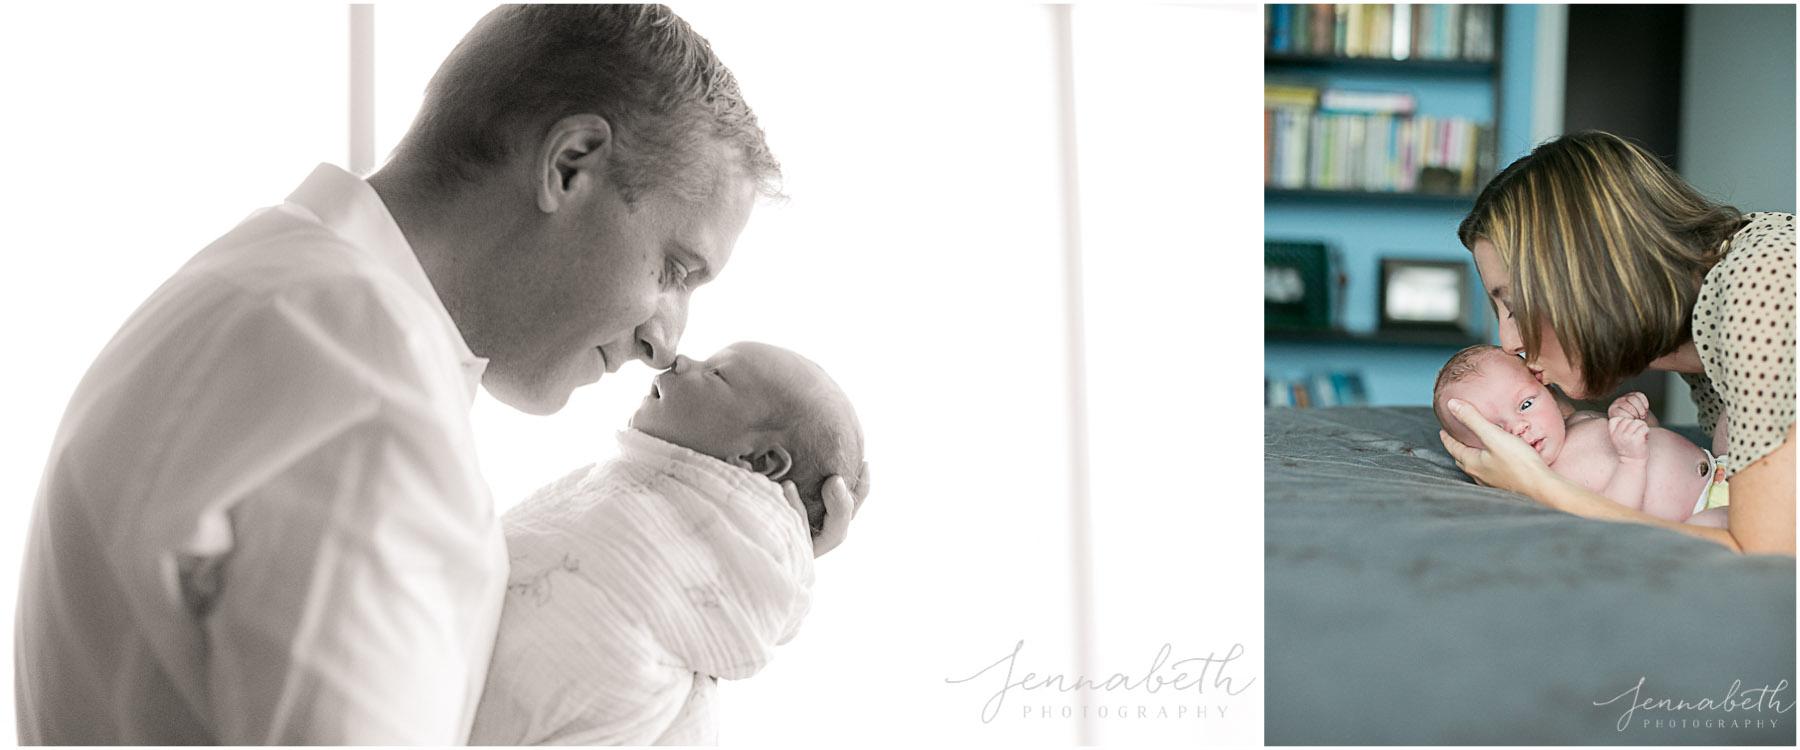 JennaBethPhotography-BurgNewborn-3.jpg